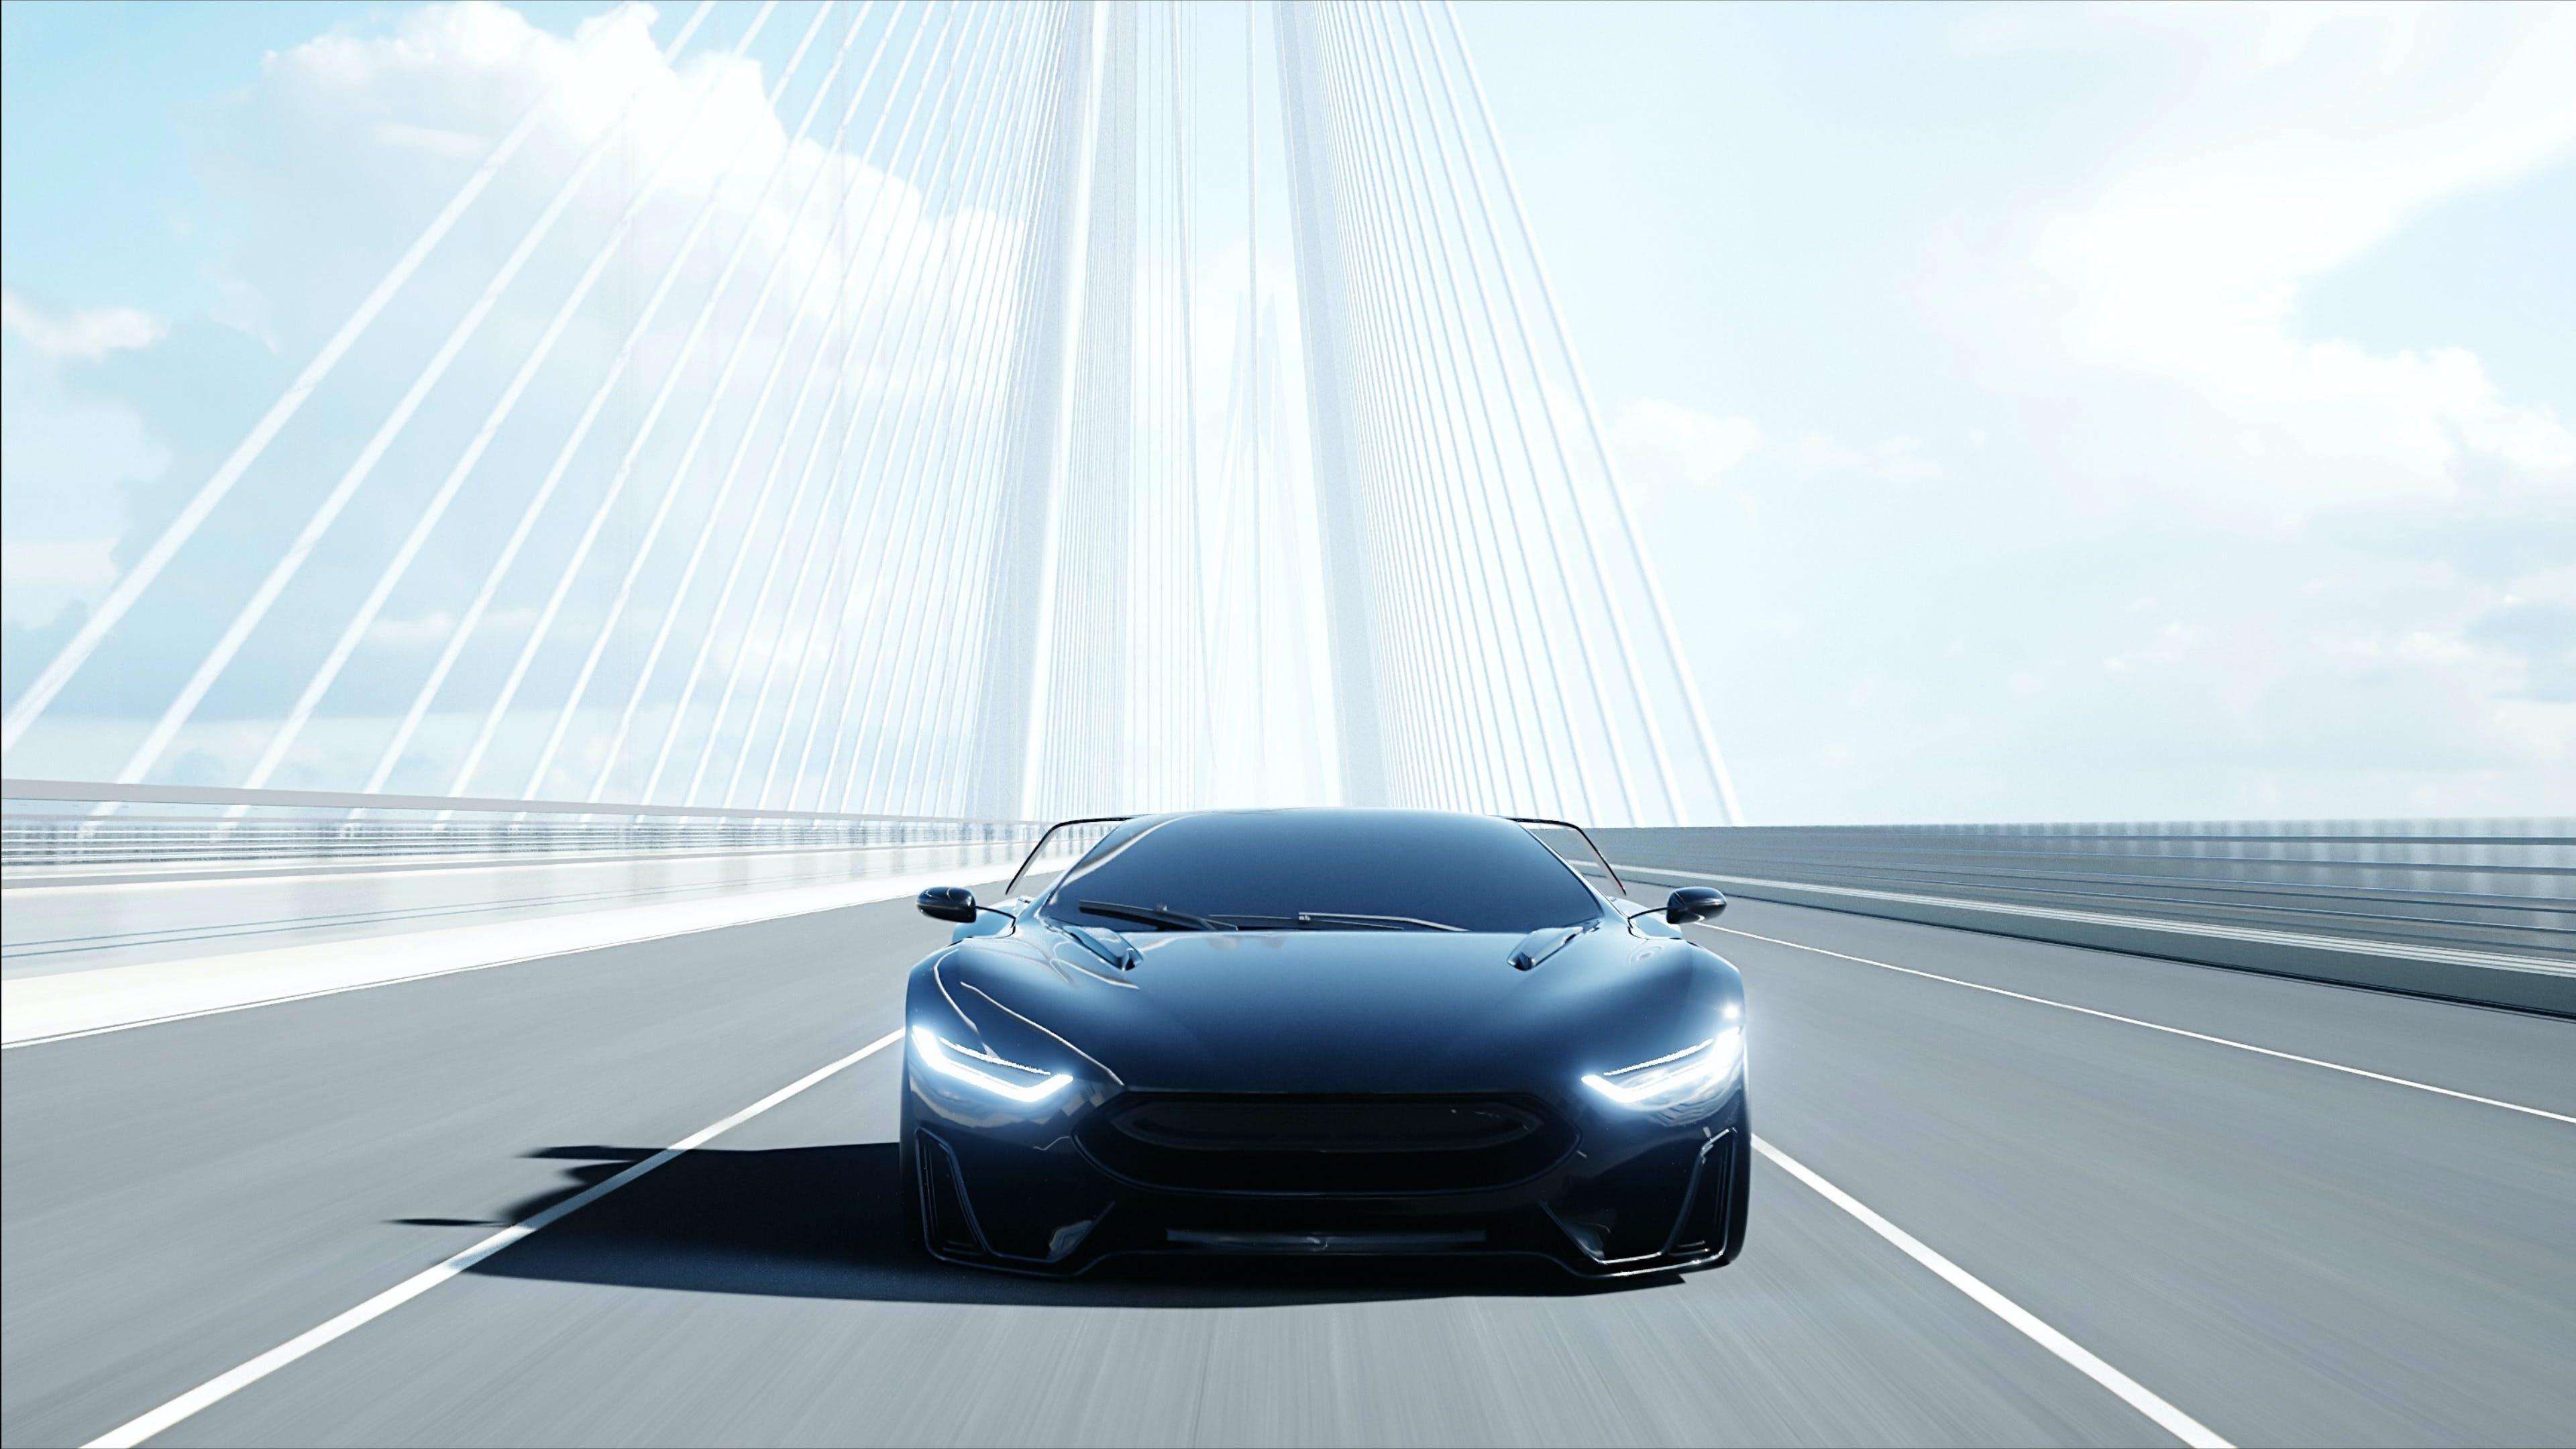 The Future of Automotive E/E Systems Development